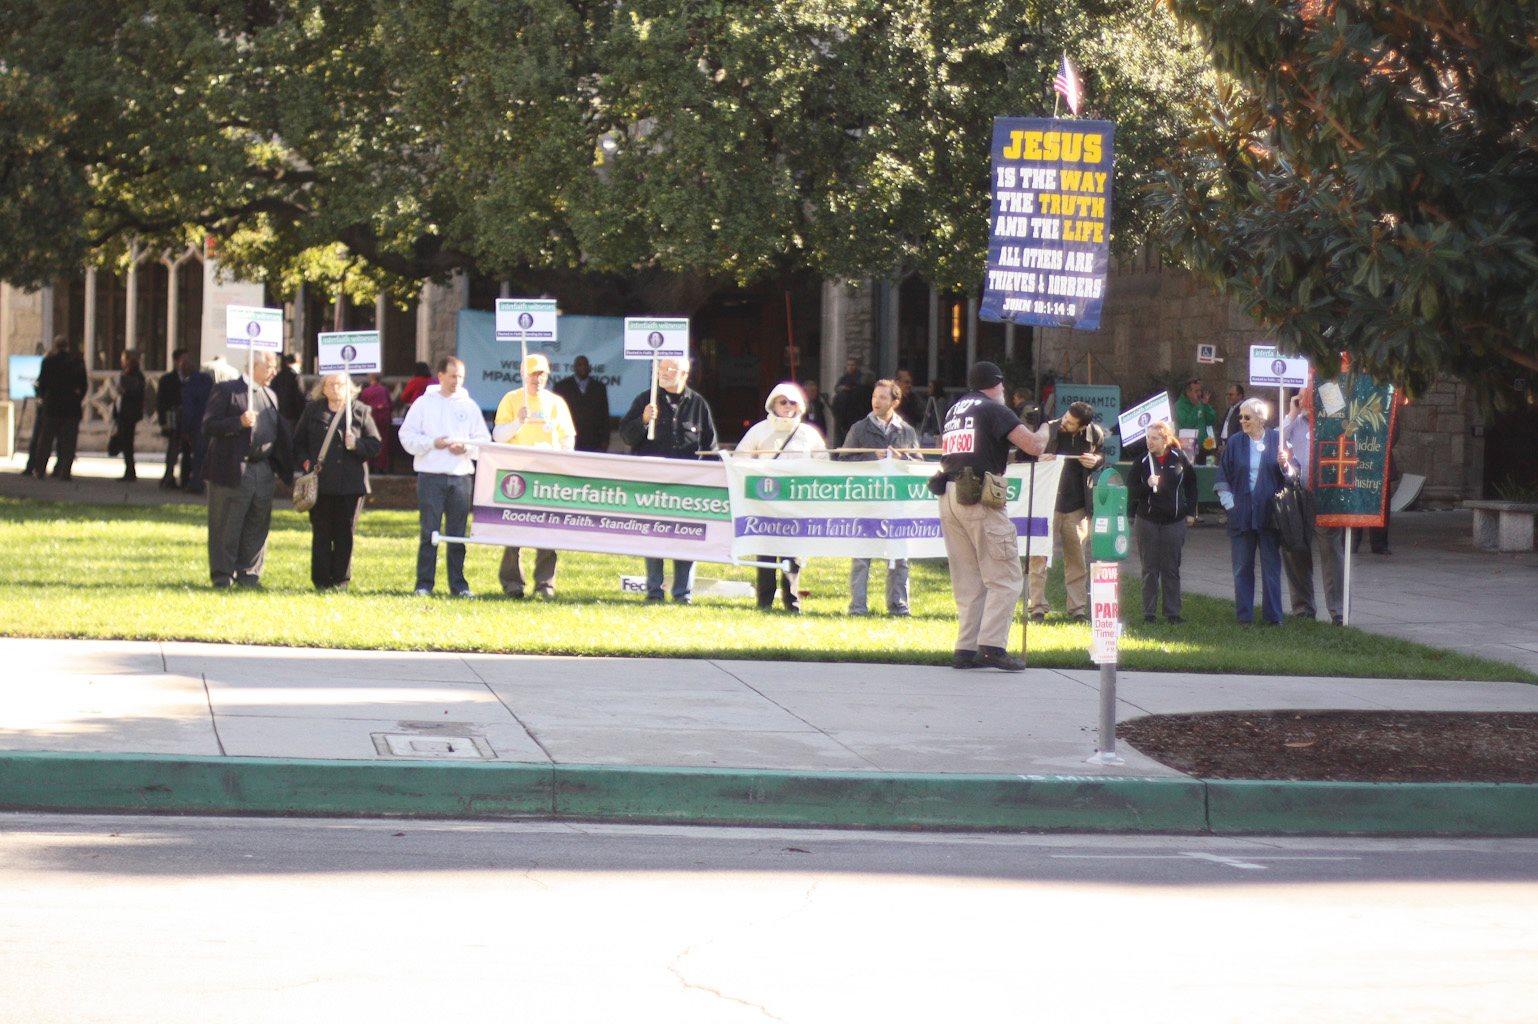 2012-12-18-counterprotest2.jpg